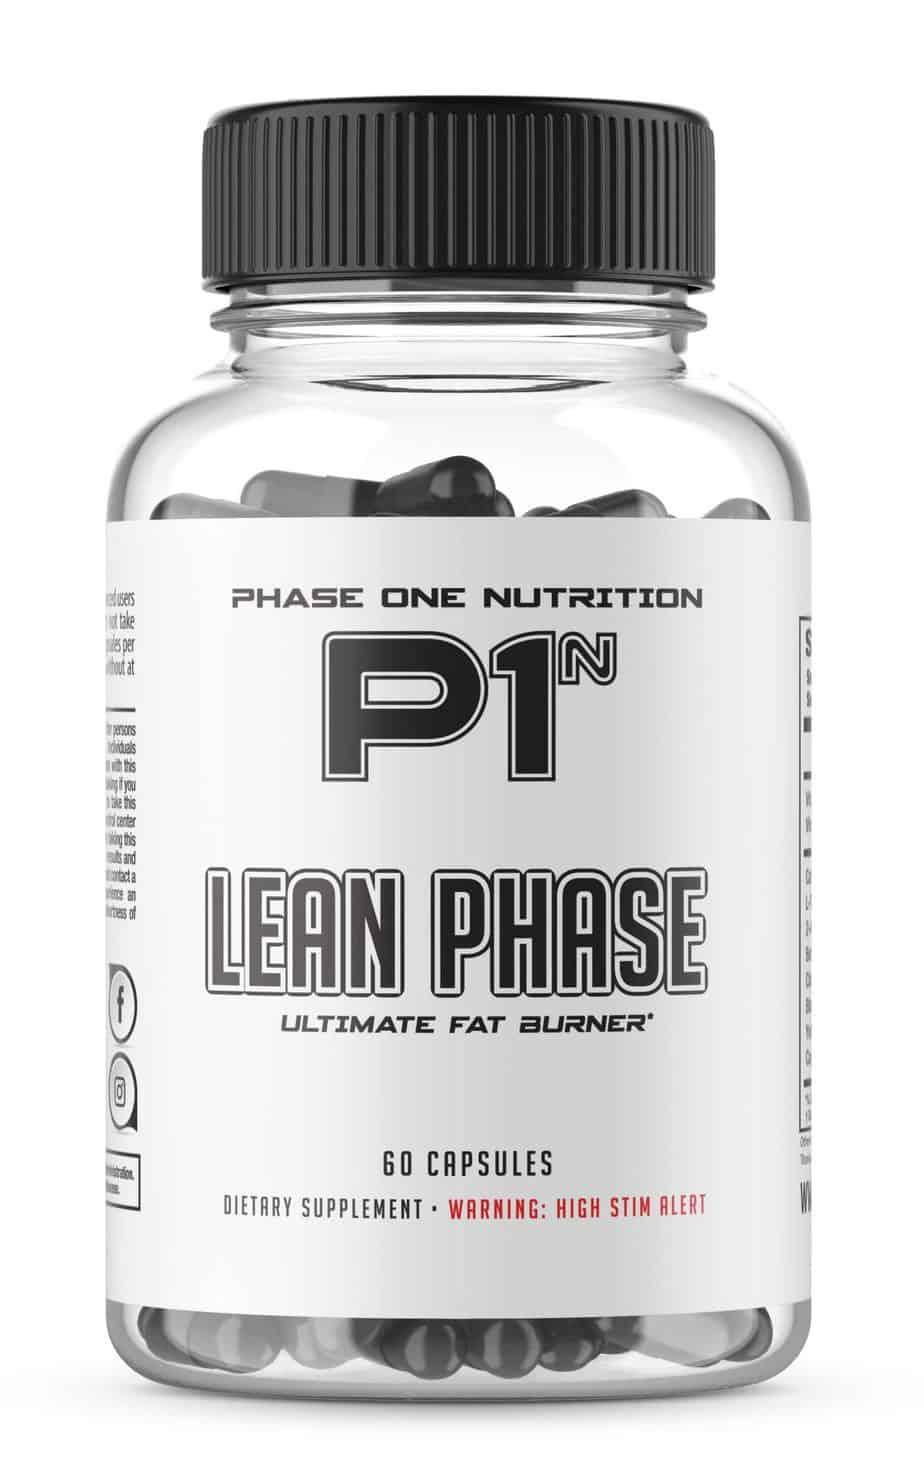 Lean Phase Fat Burner - Phase 1 Nutrition